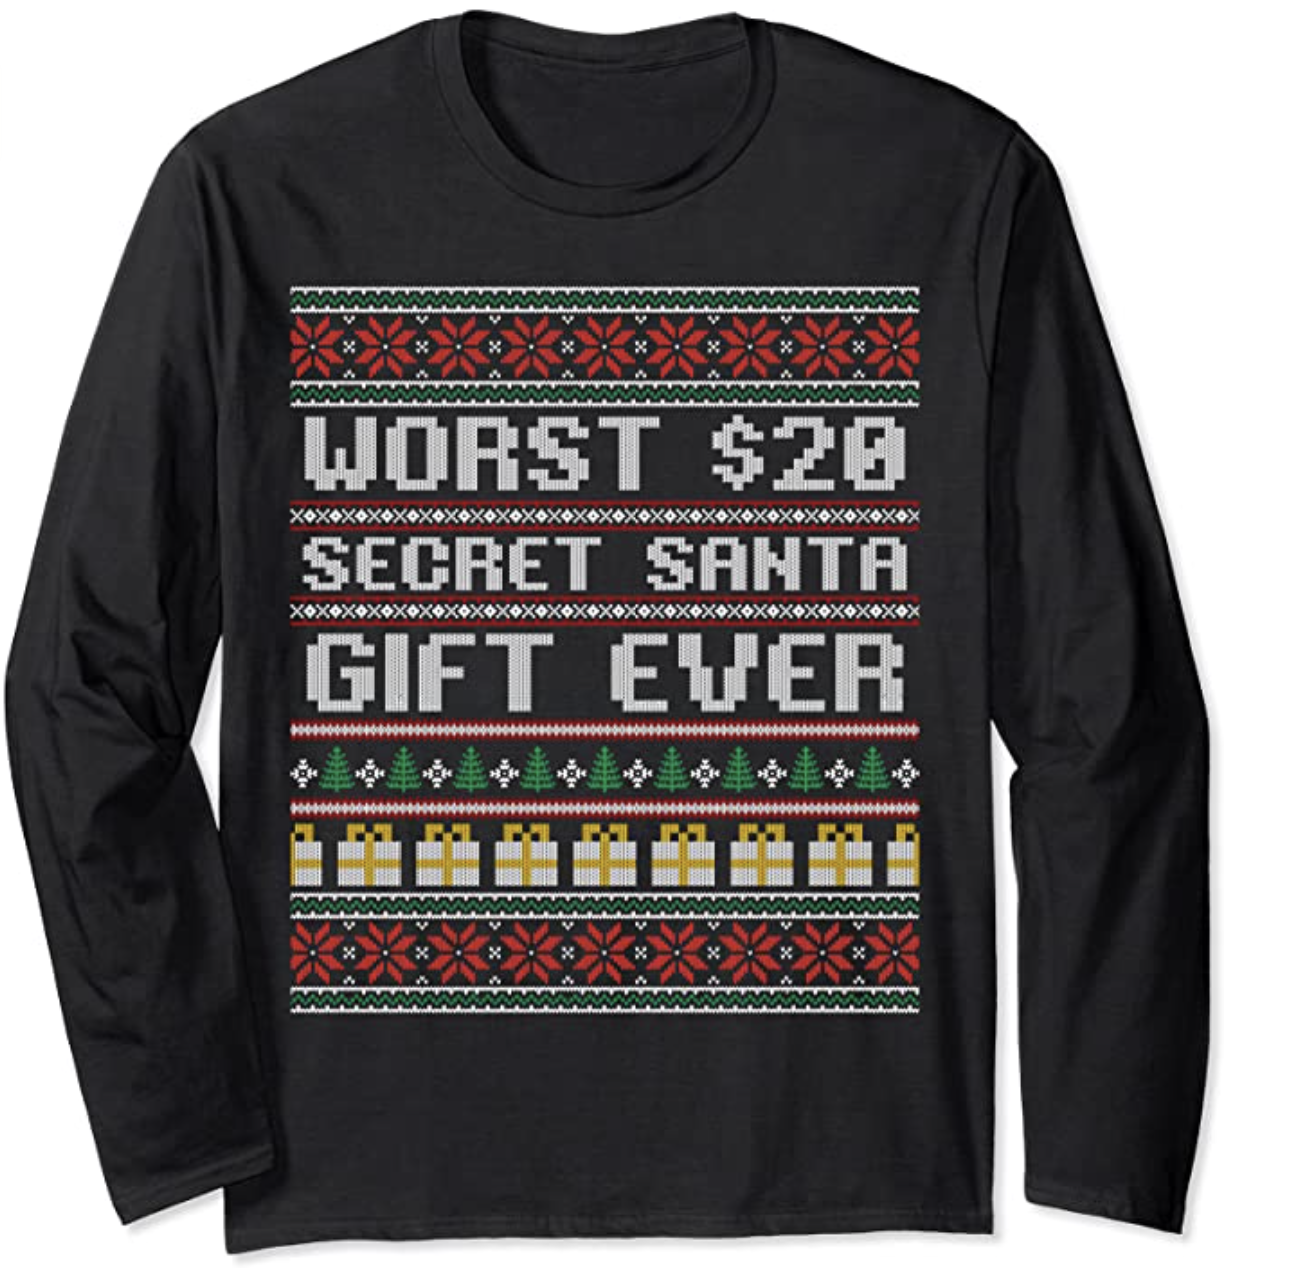 secret-santa-gift-ideas-tshirt